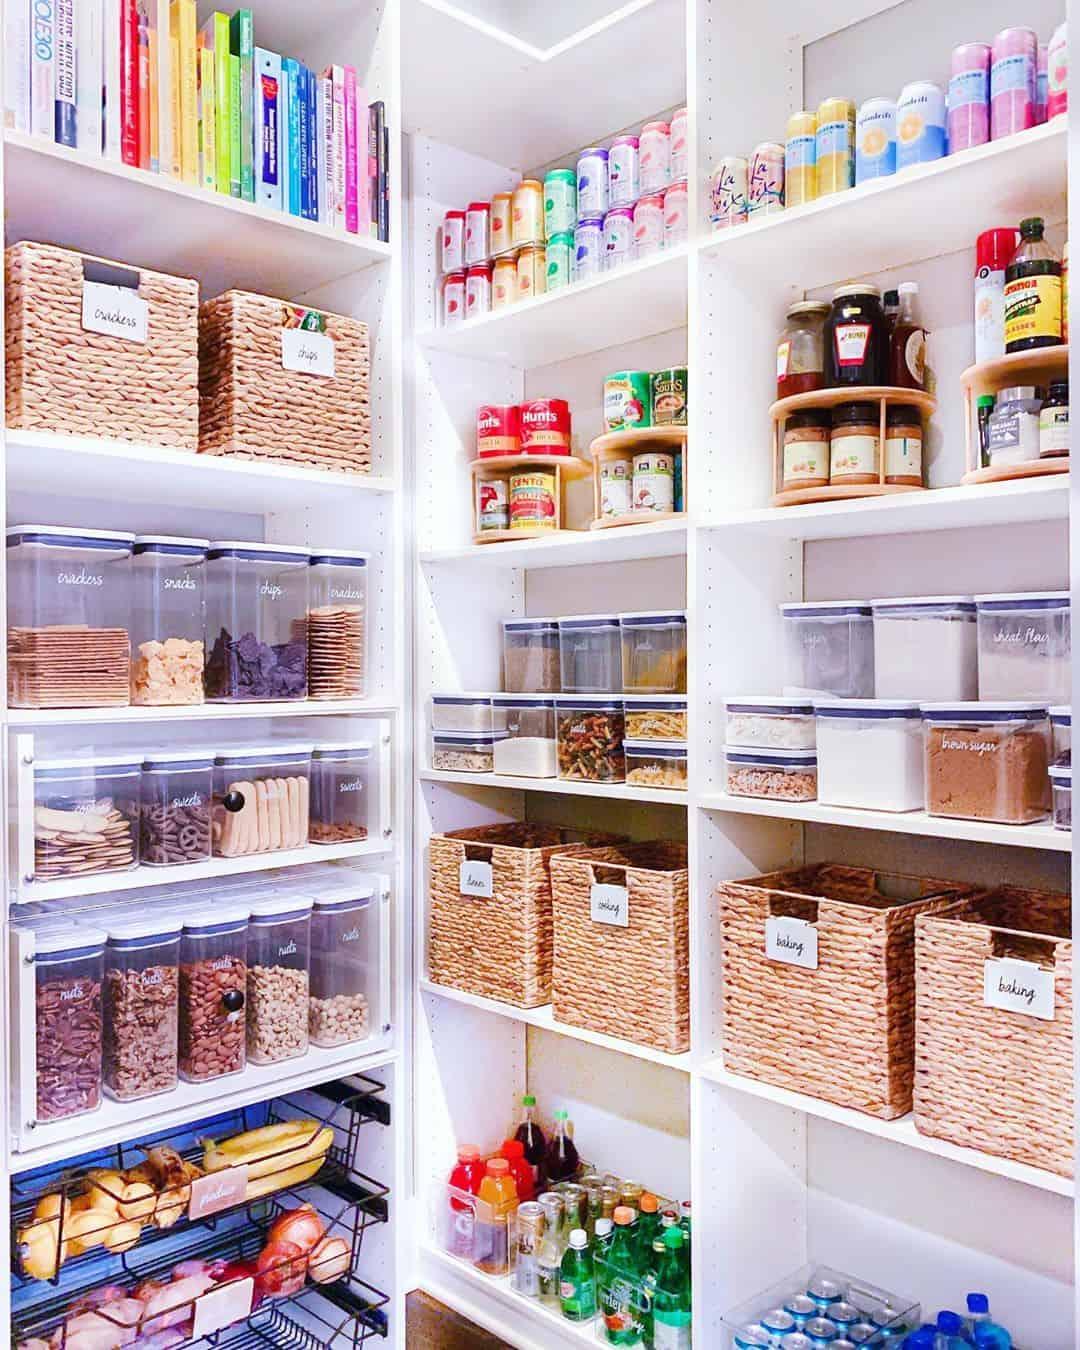 storage and more storage